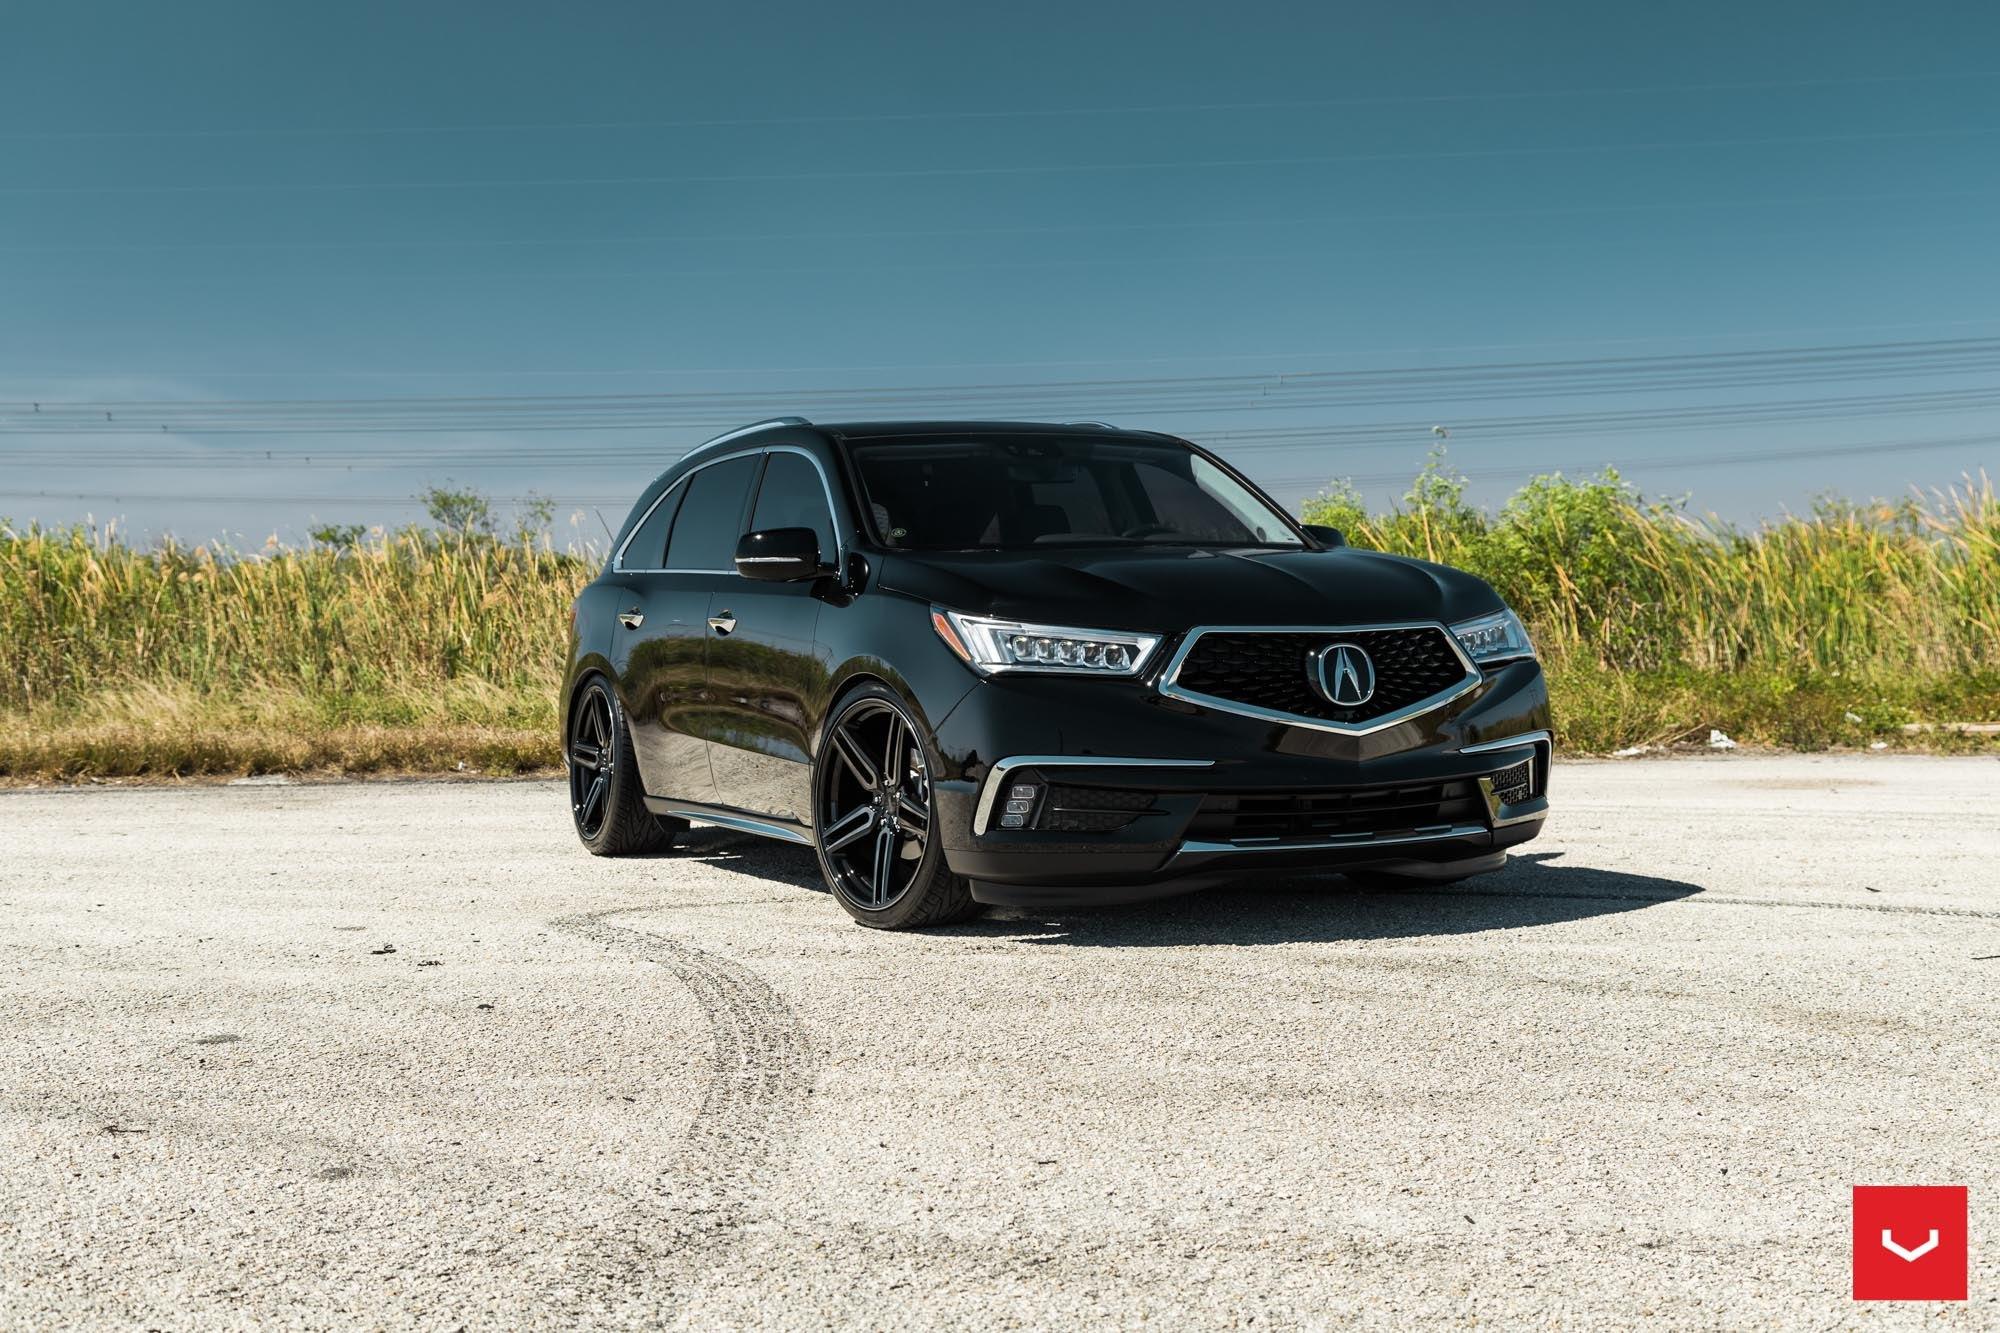 Black On Black Mean Acura Mdx Enhanced With Crystal Clear Headlights Carid Com Gallery